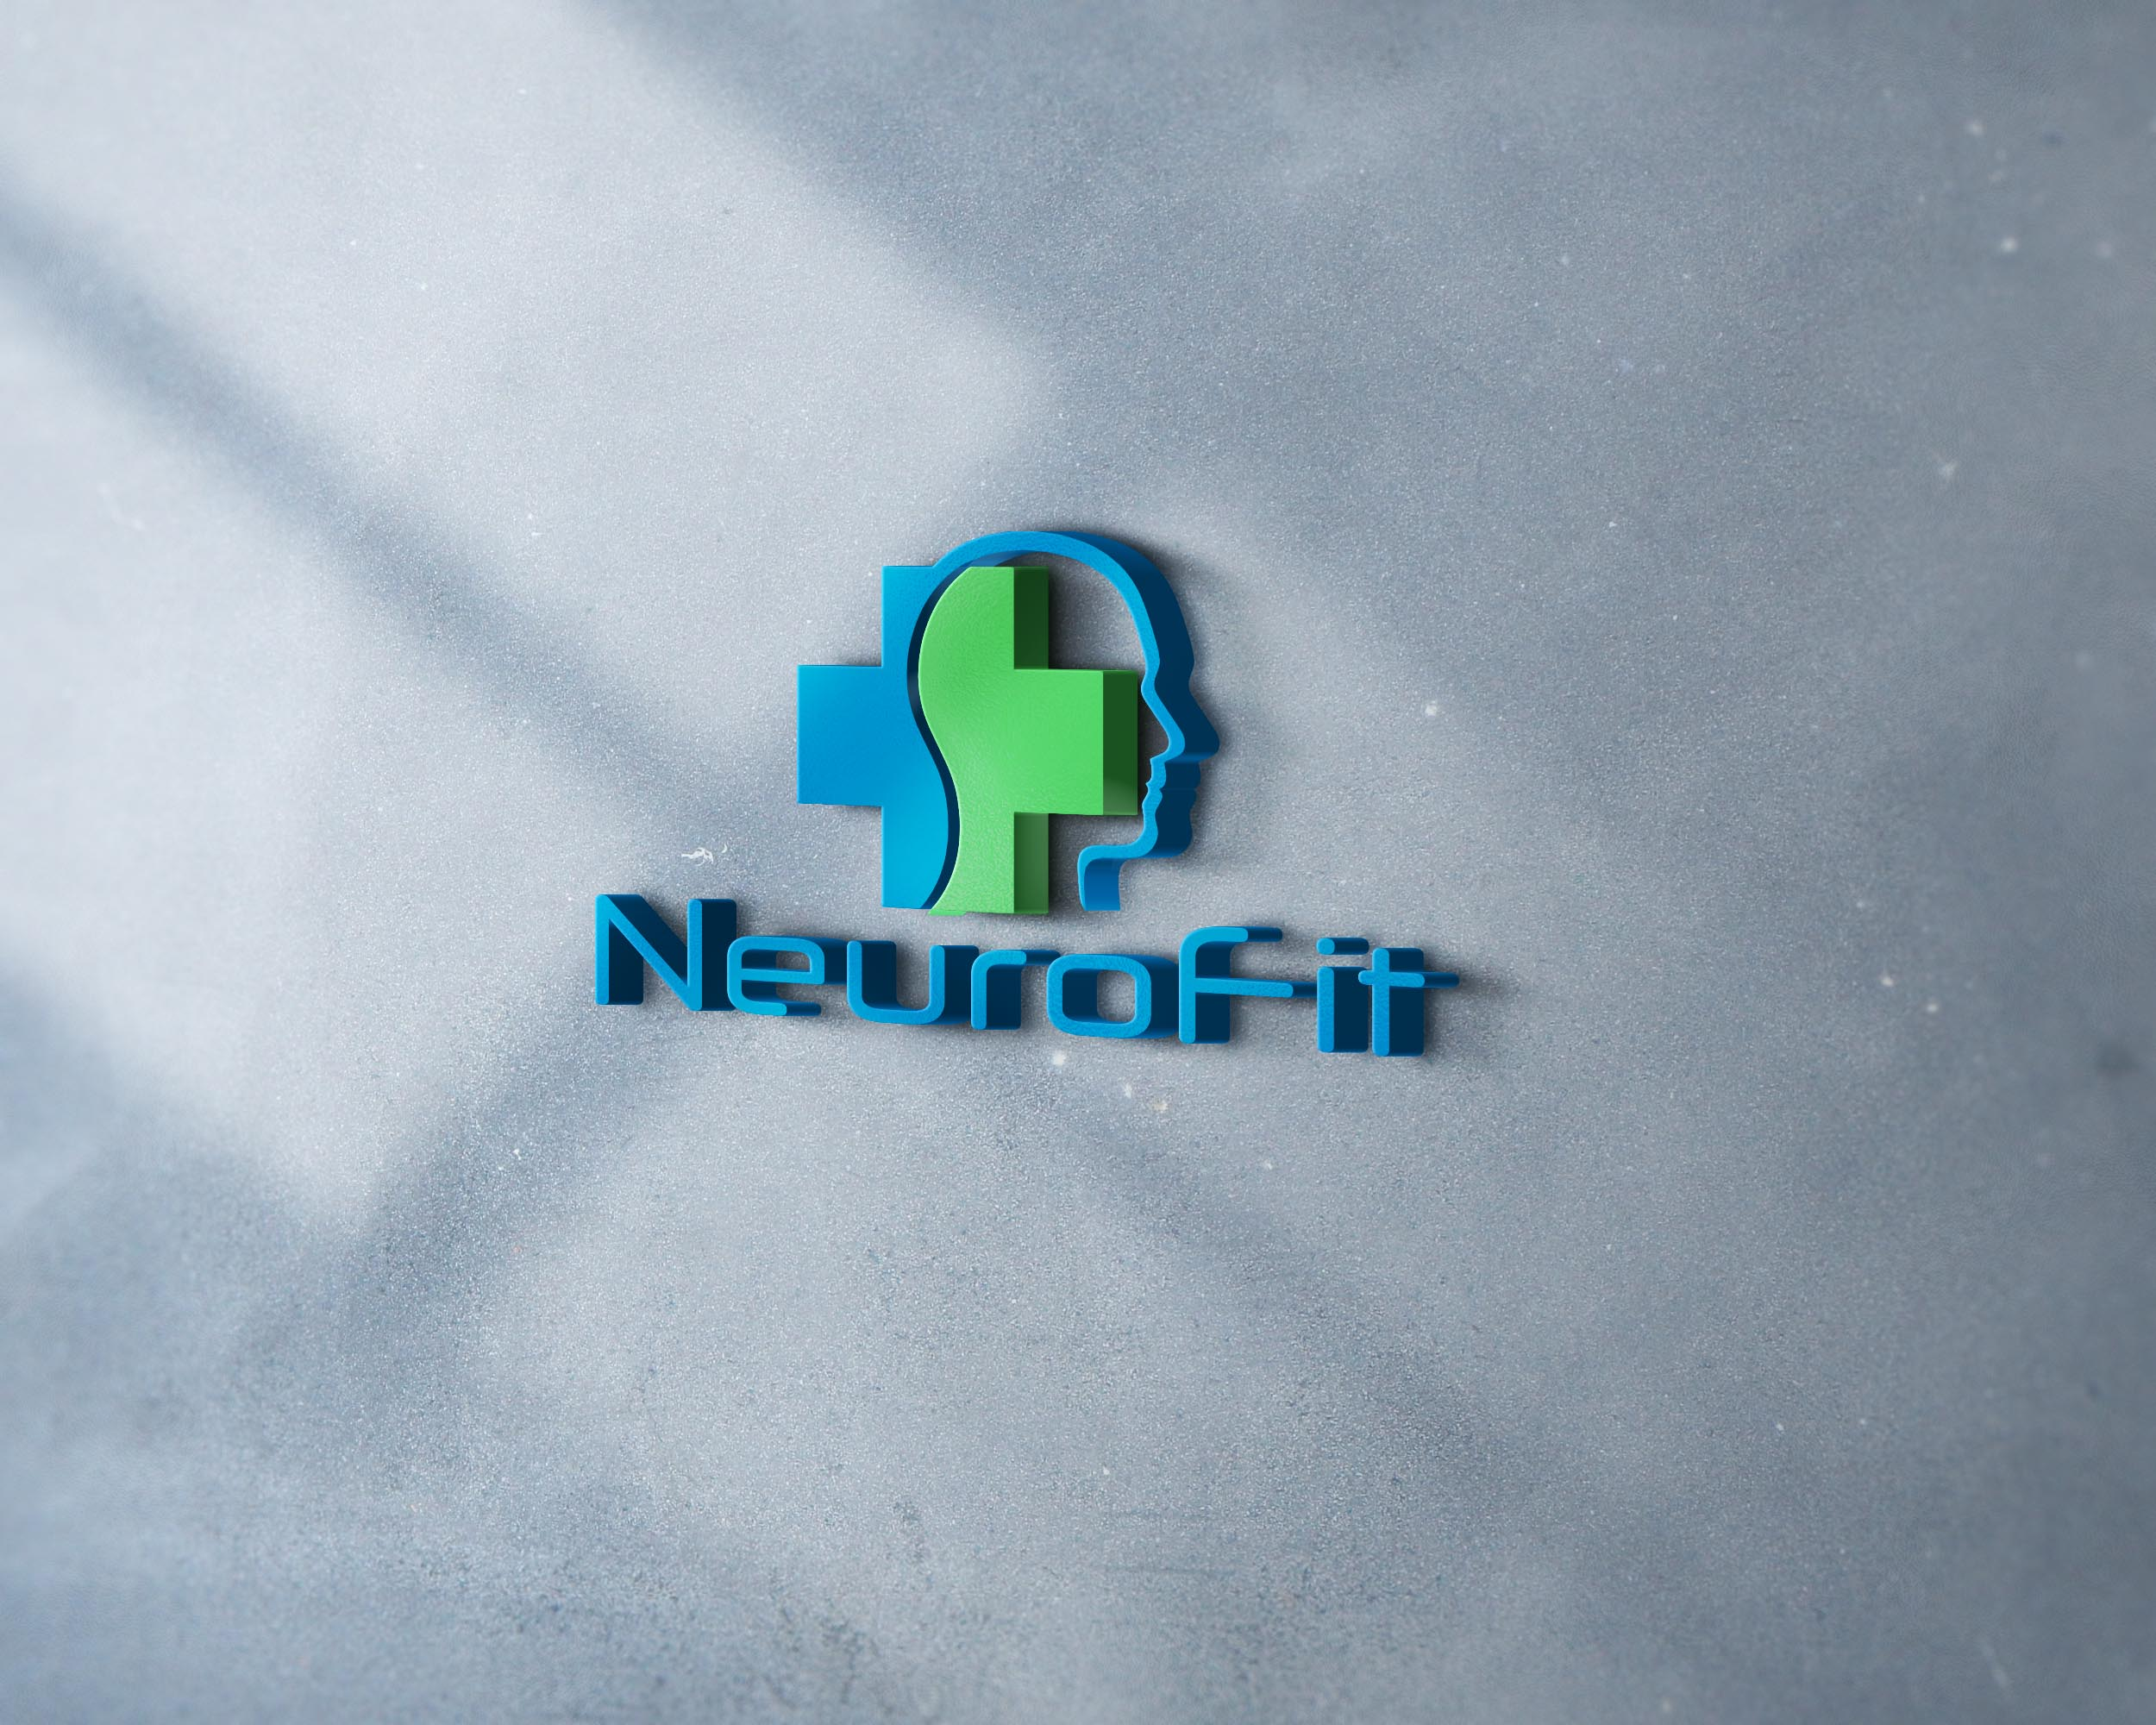 Neurofit Neurofeedback